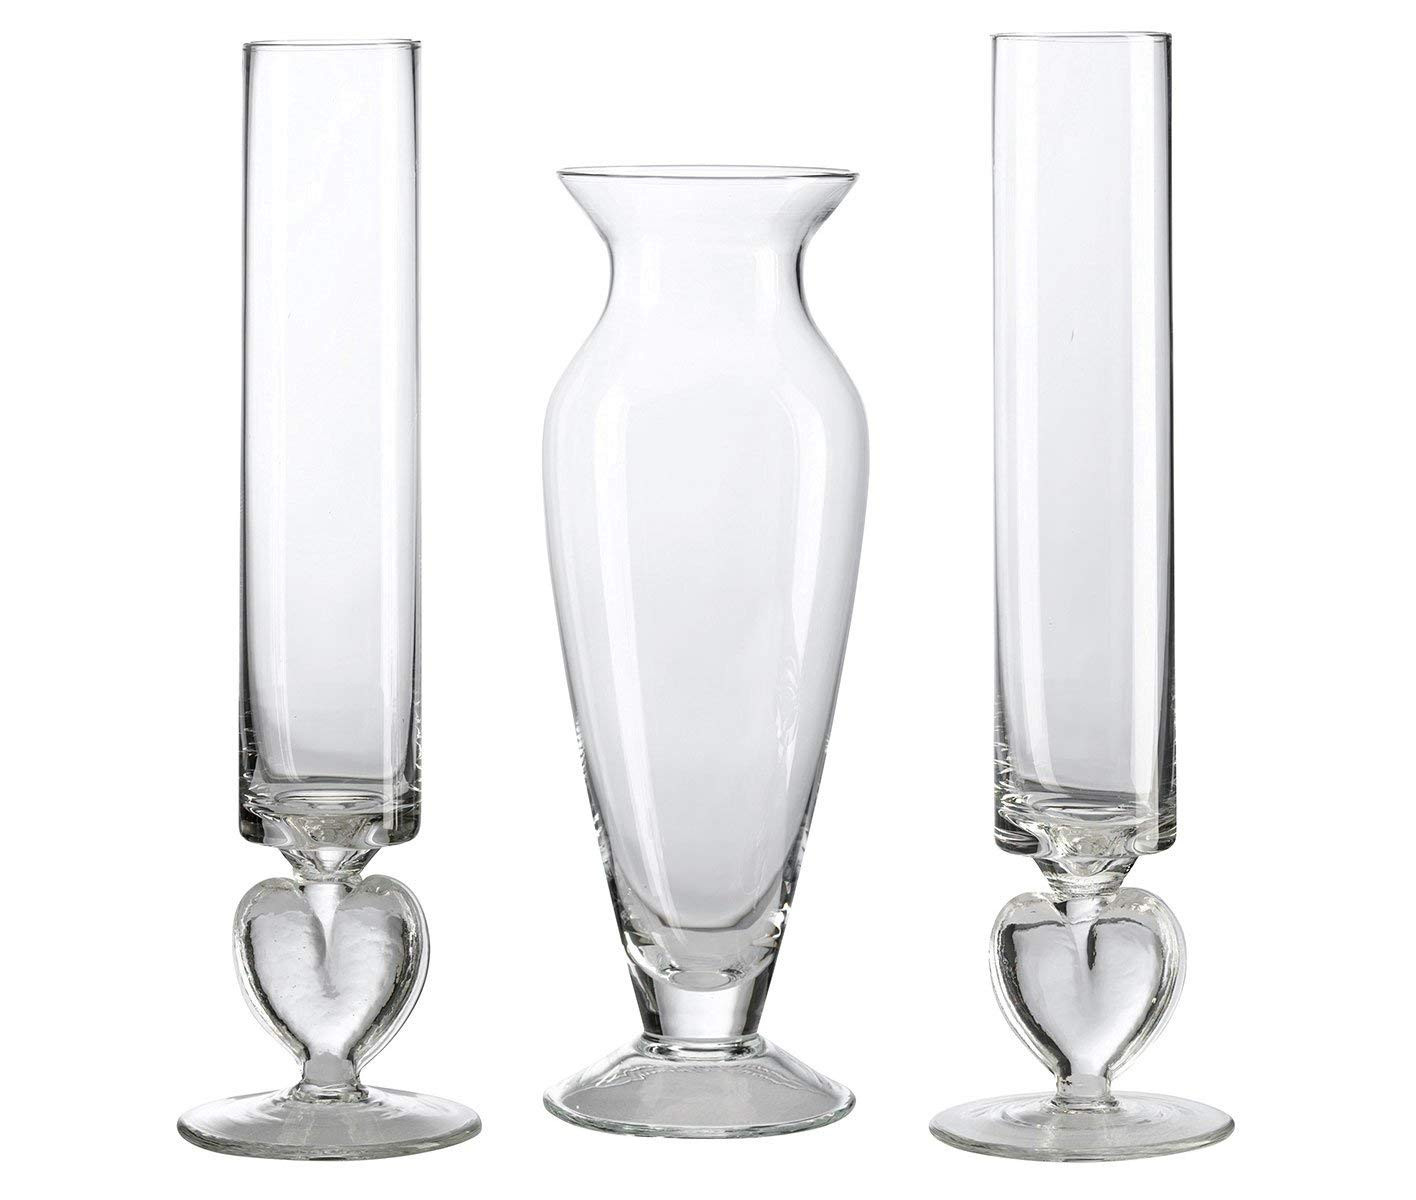 tall silver urn vase of amazon com lillian rose unity sand ceremony wedding vase set home for amazon com lillian rose unity sand ceremony wedding vase set home kitchen